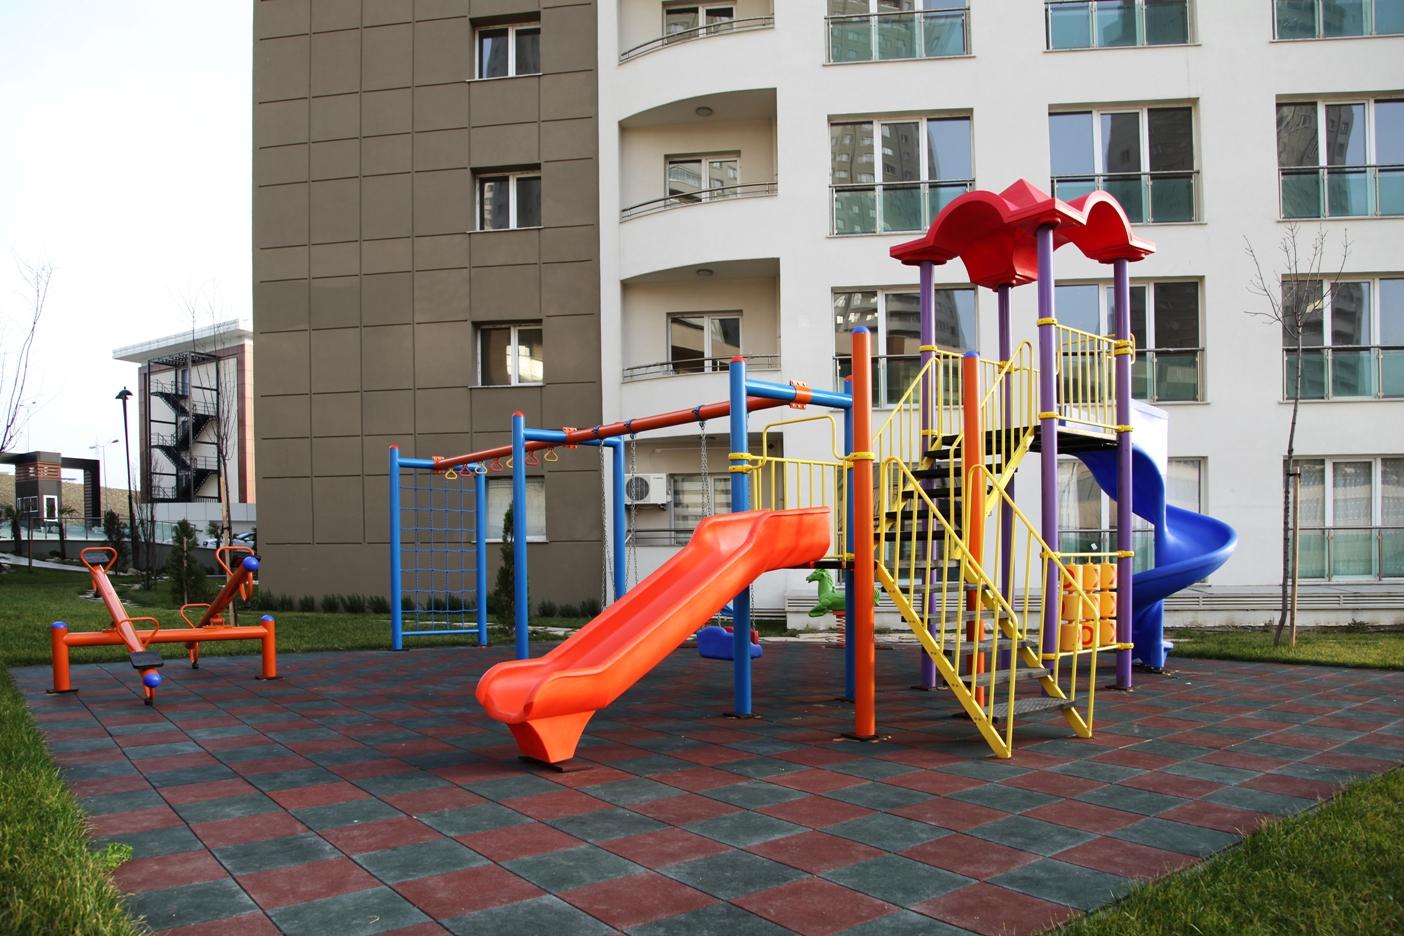 beylikduzu property in istanbul for sale 9